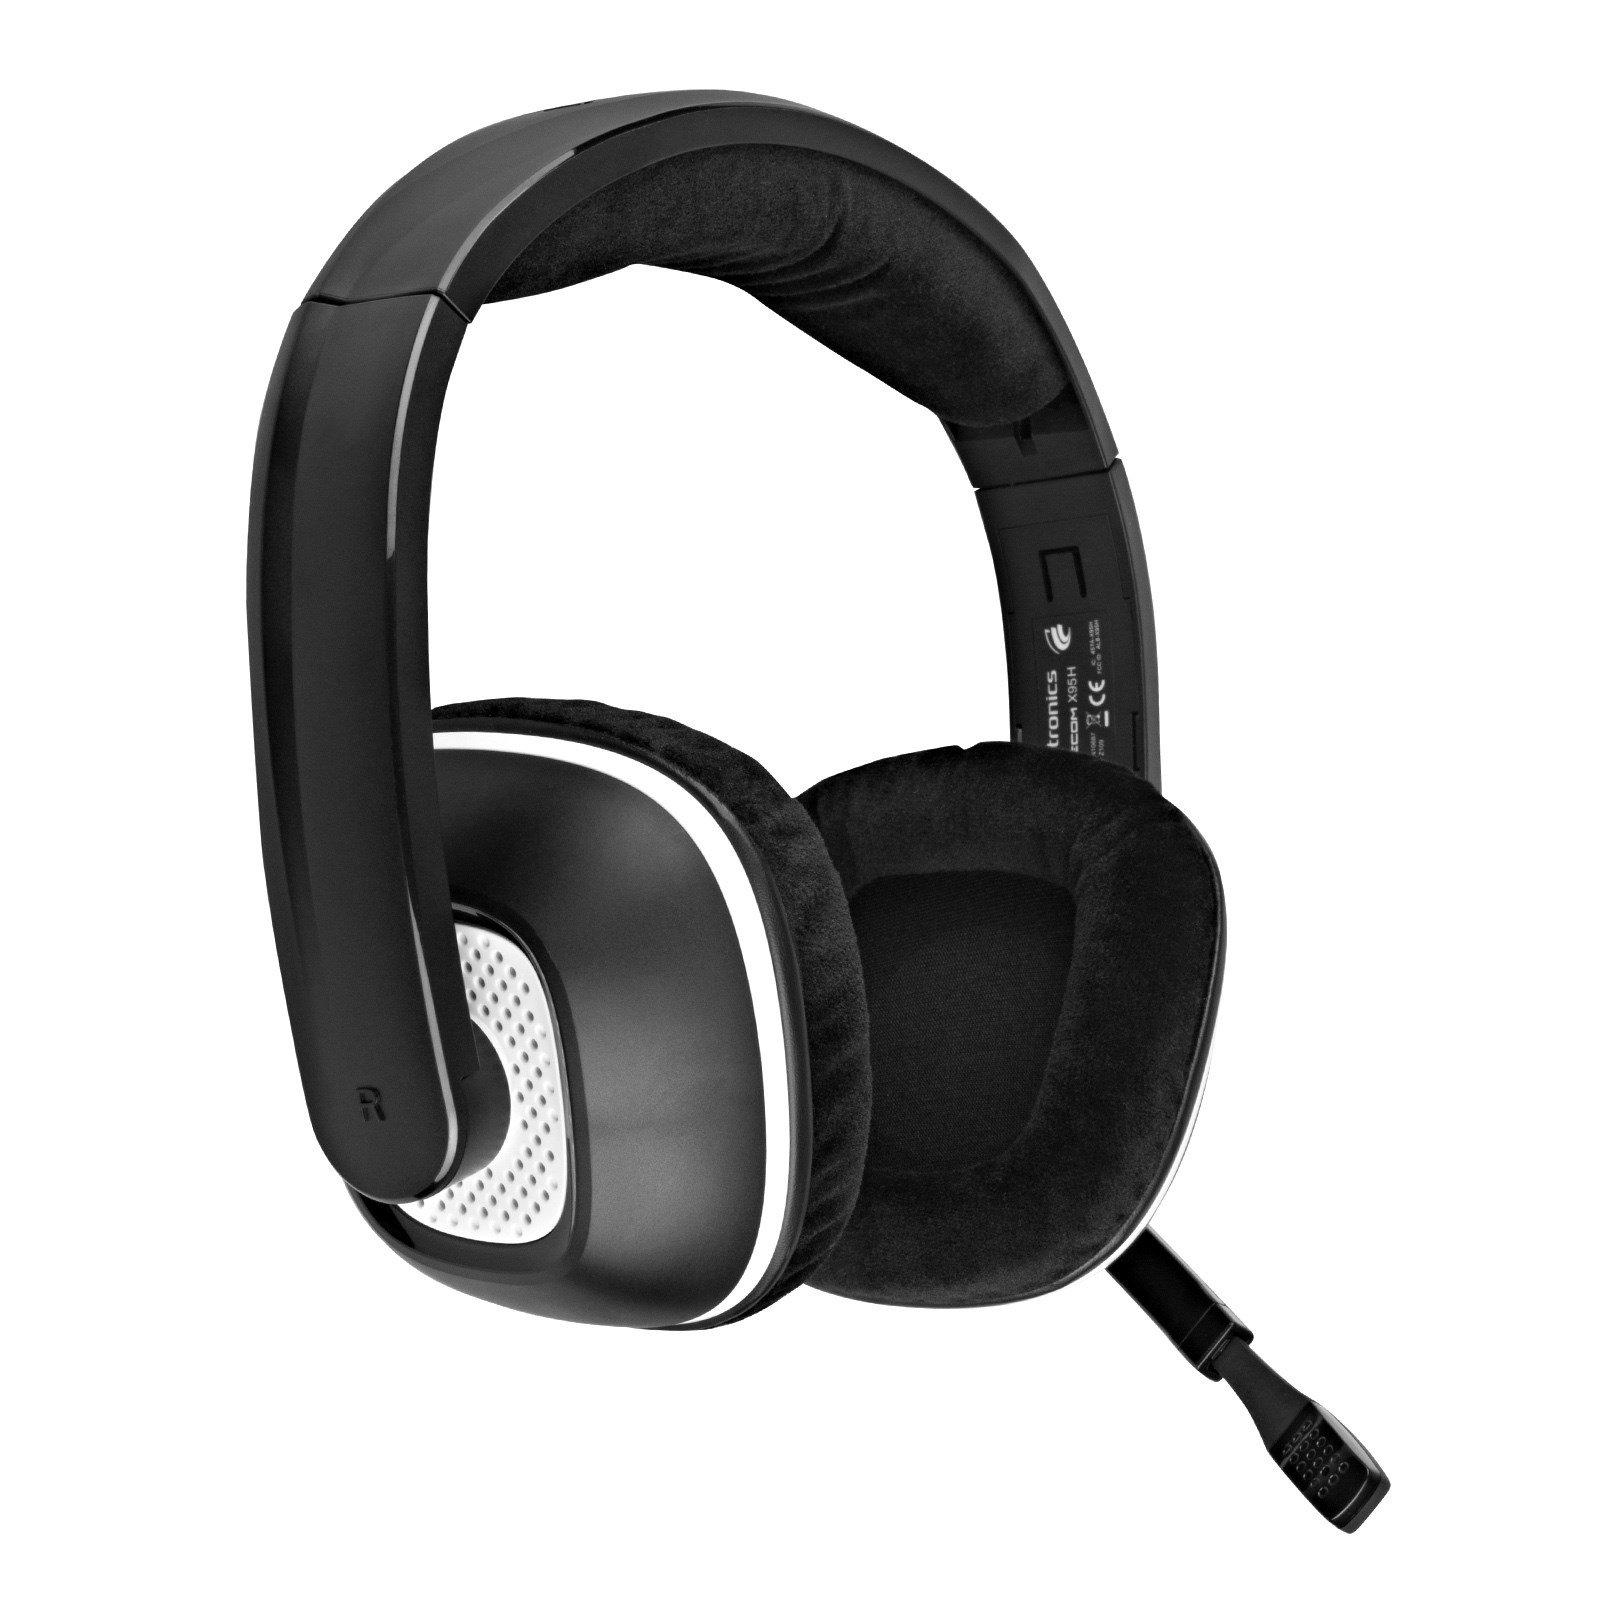 Plantronics Gamecom X95 Gaming Headset for Xbox 360 - Black (Renewed) by Plantronics